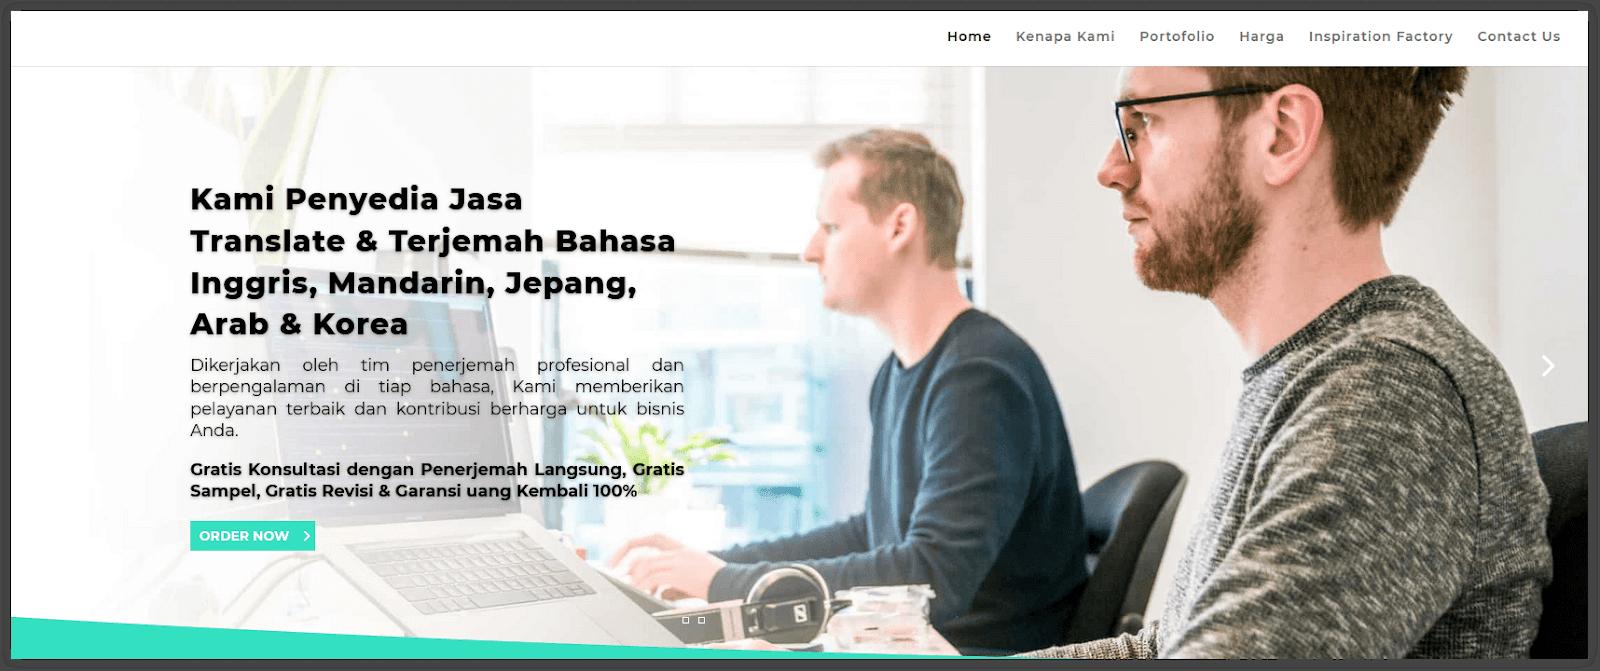 bisnis online jasa terjemah